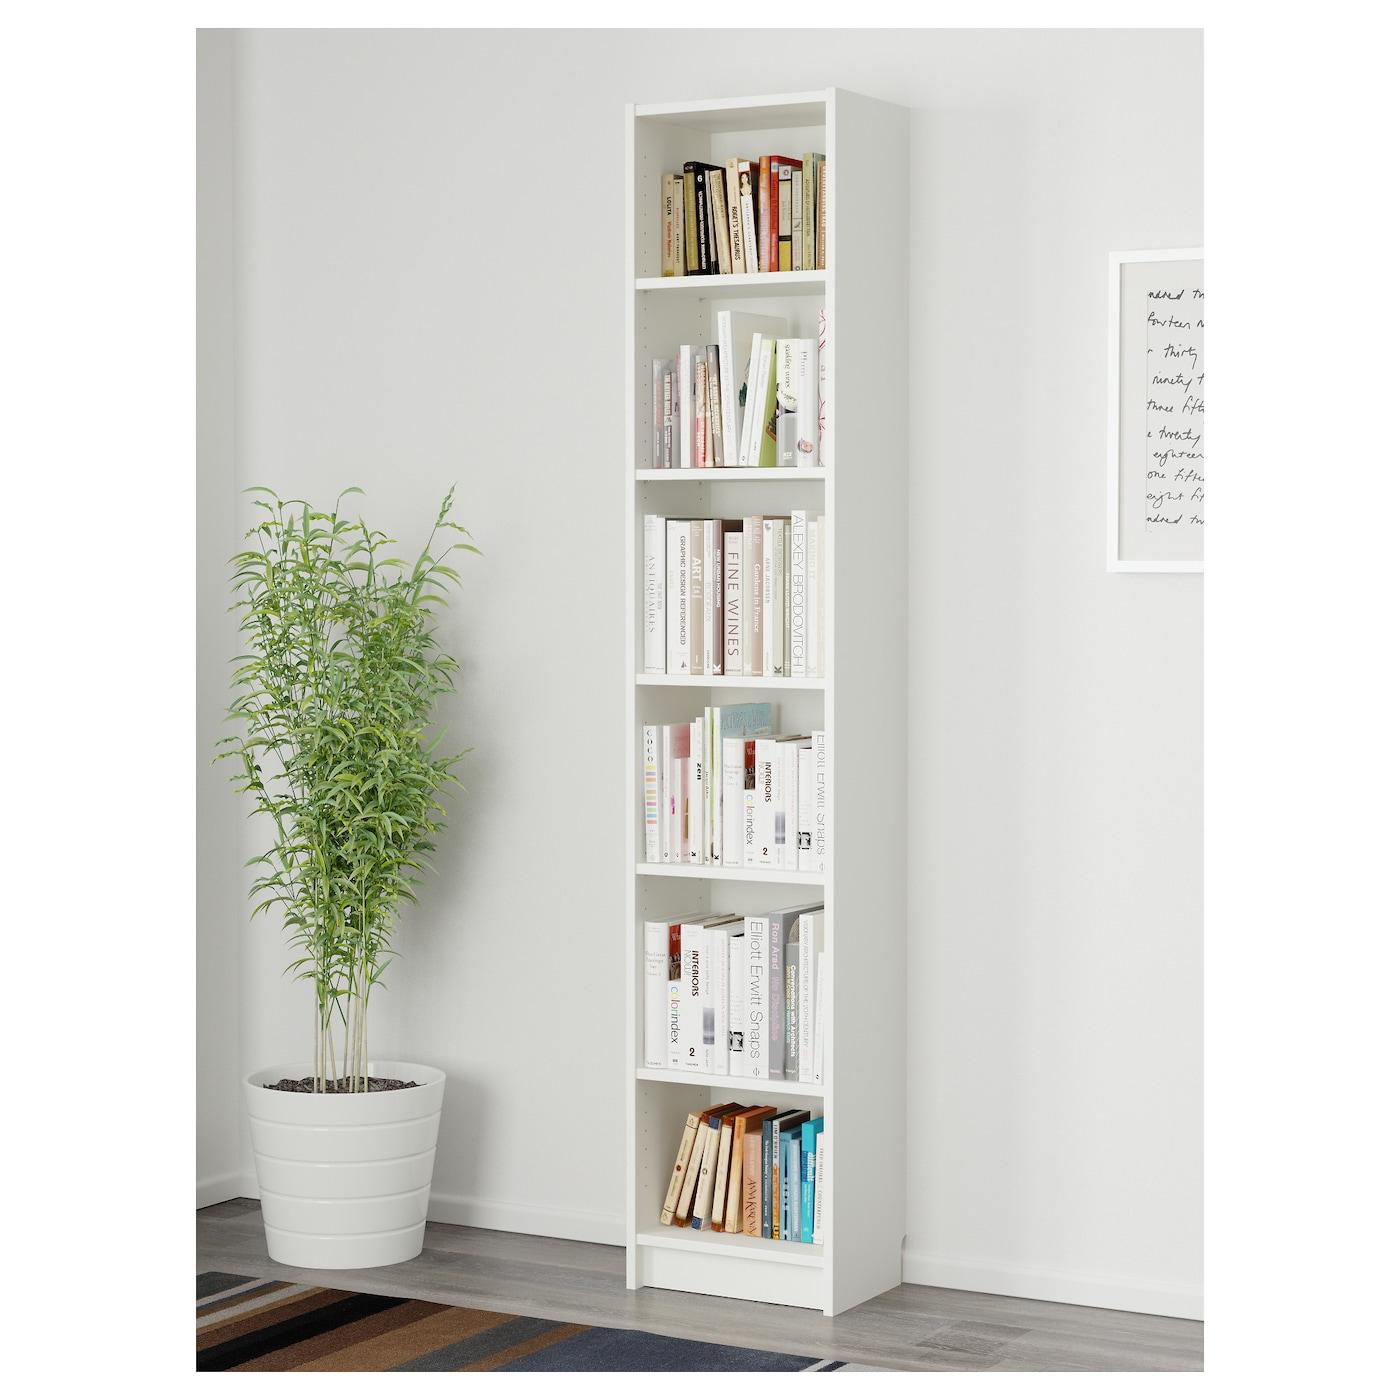 https://www.ikea.com/be/nl/images/products/billy-boekenkast-wit__0394564_pe561387_s5.jpg